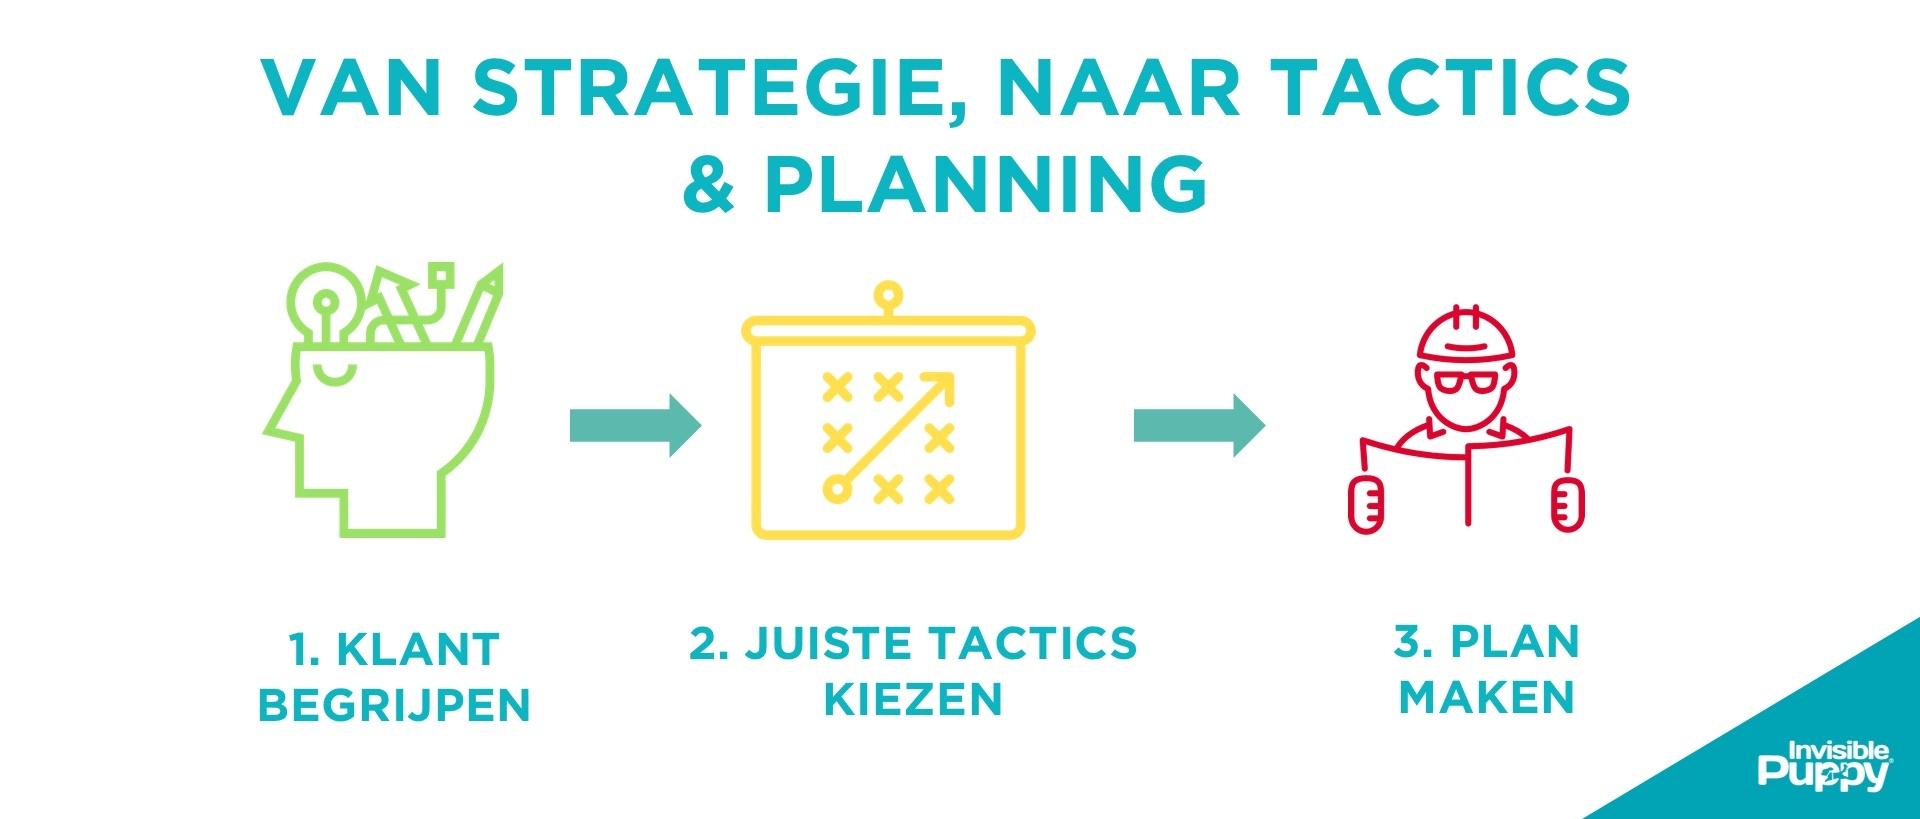 digitaal-marketing-plan-3-stappenplan.jpg